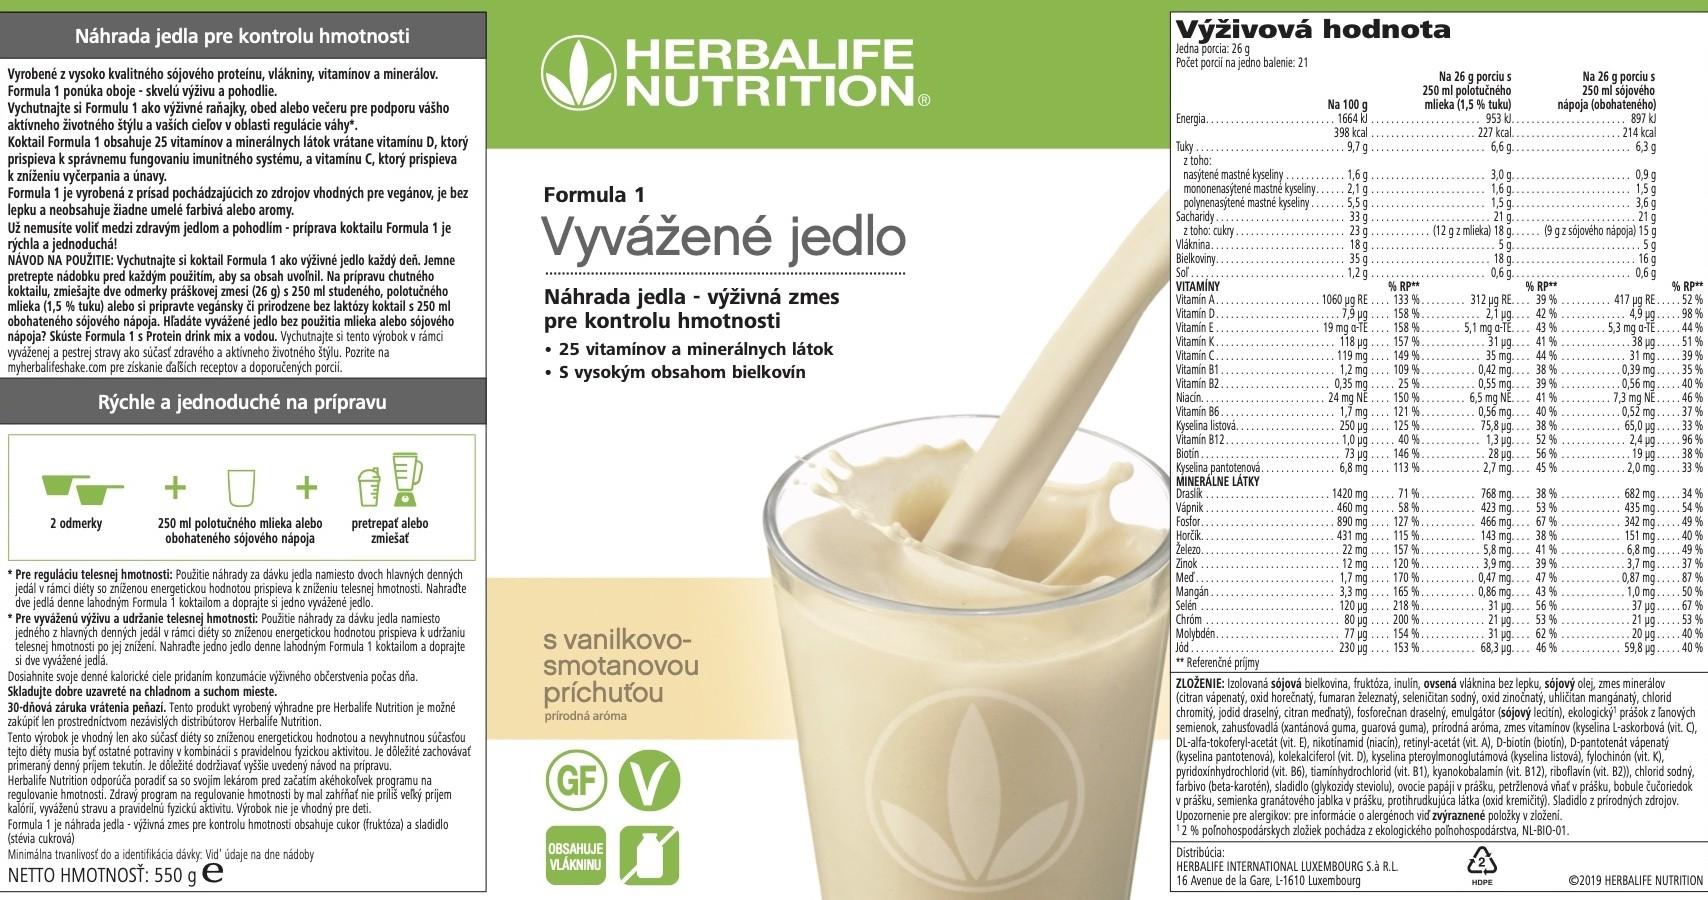 Formula 1 koktail vanilka-smotana vyzivova hodnota